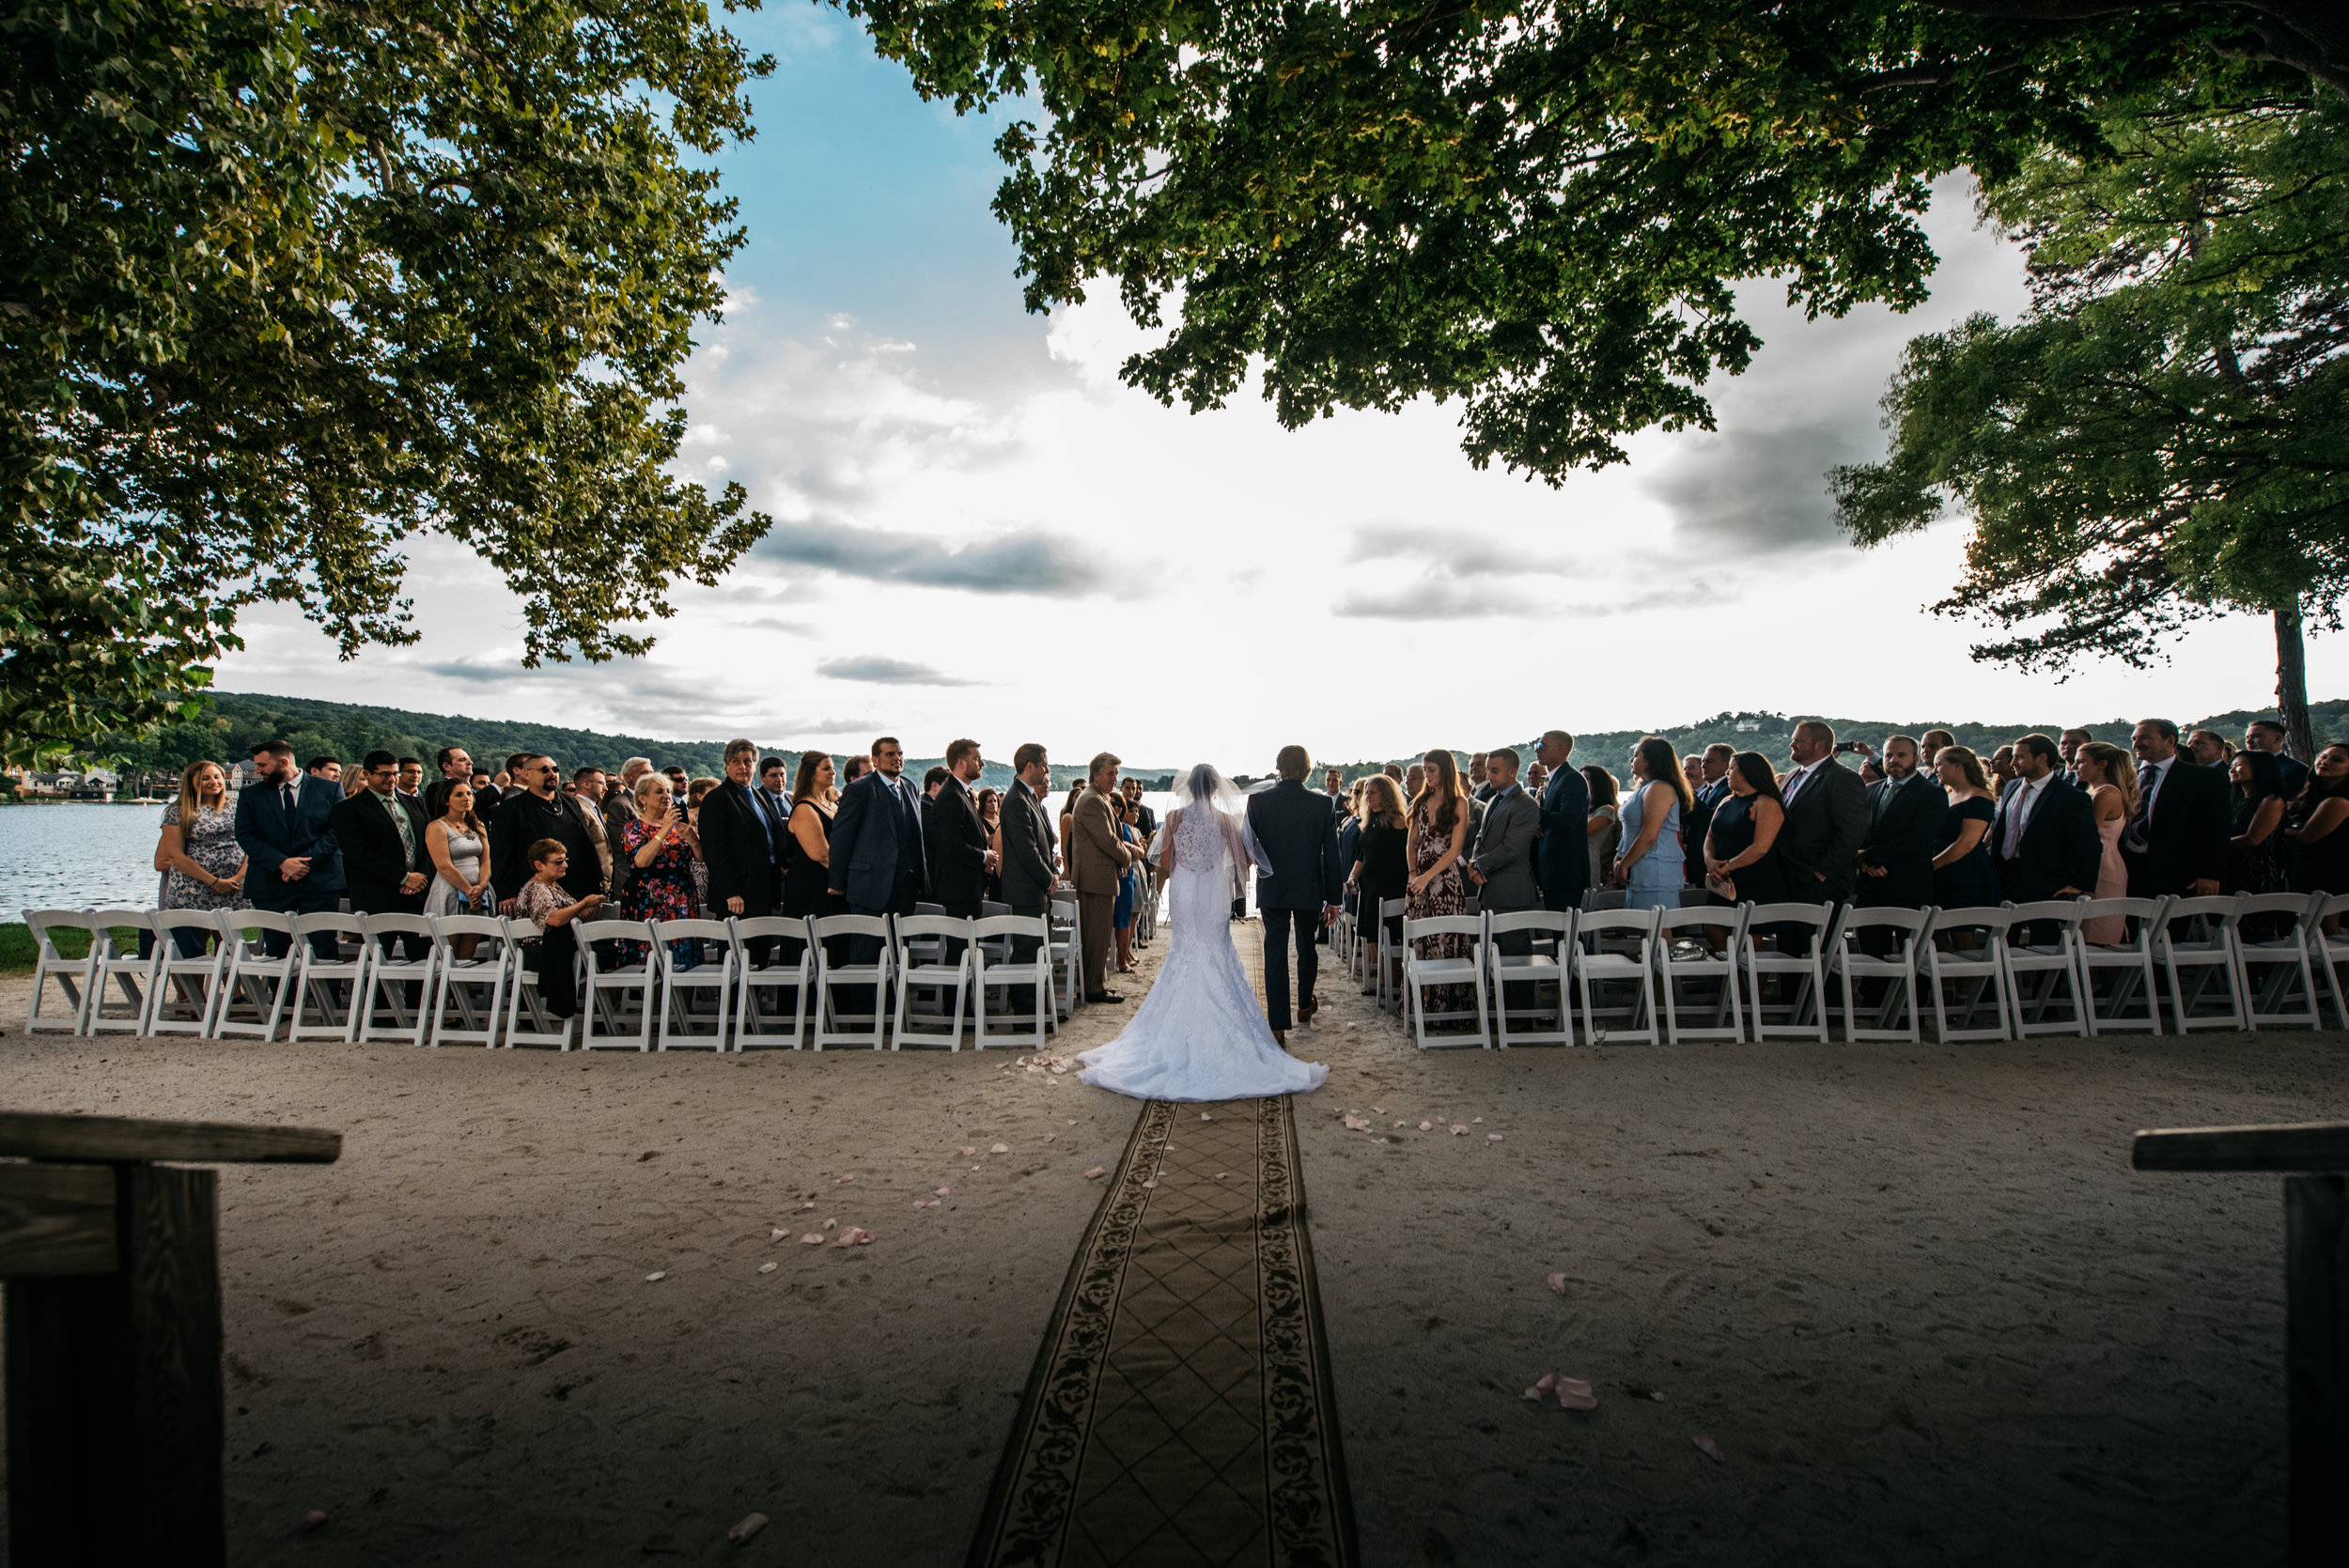 WeddingPhotos | NJPhotographer | Highlights-6-23.jpg